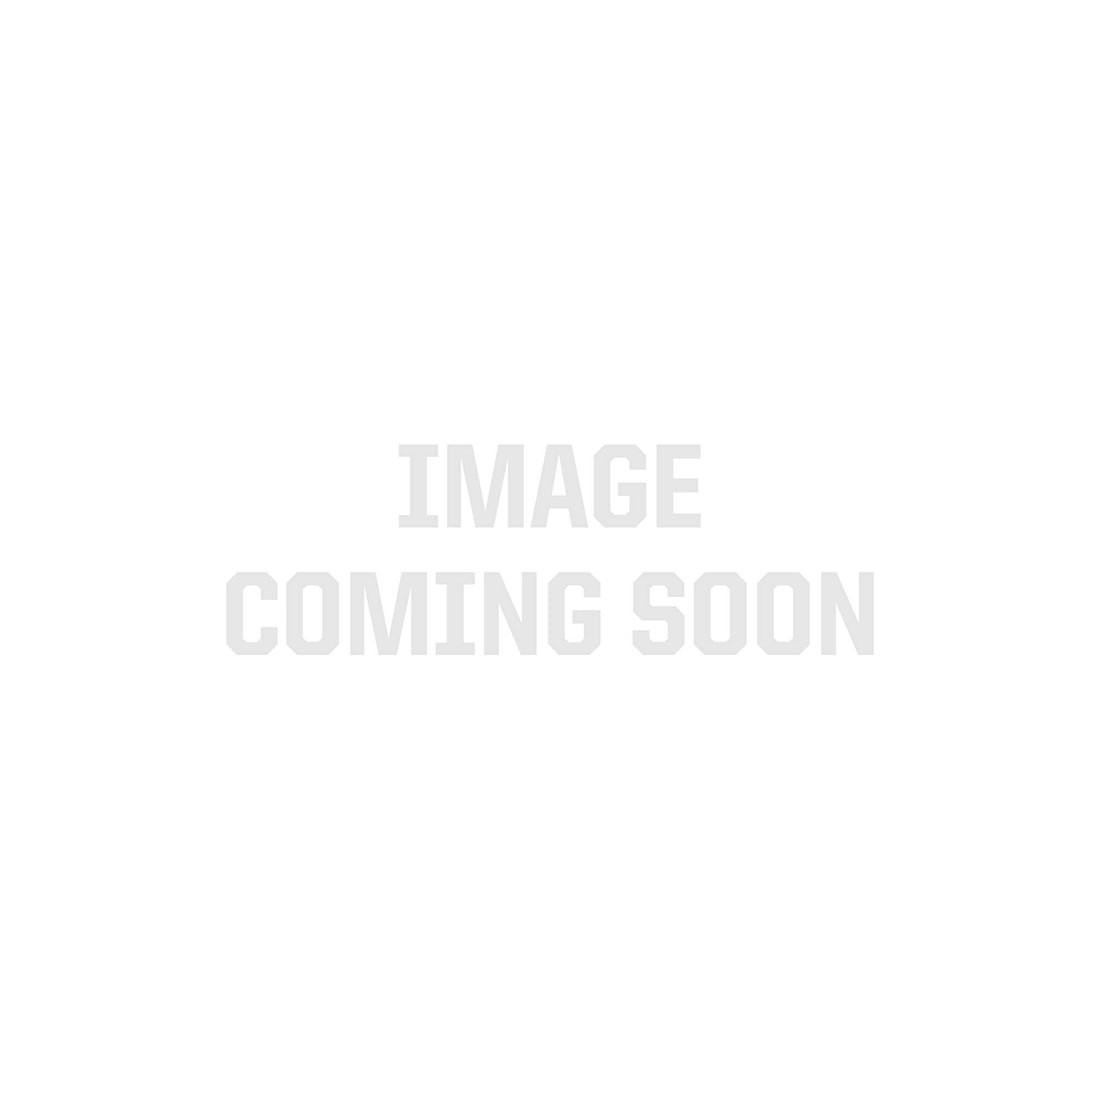 Waterproof Side Mount Amber 3014 Side View LED Strip Light, 96/m, 8mm wide, Sample Kit